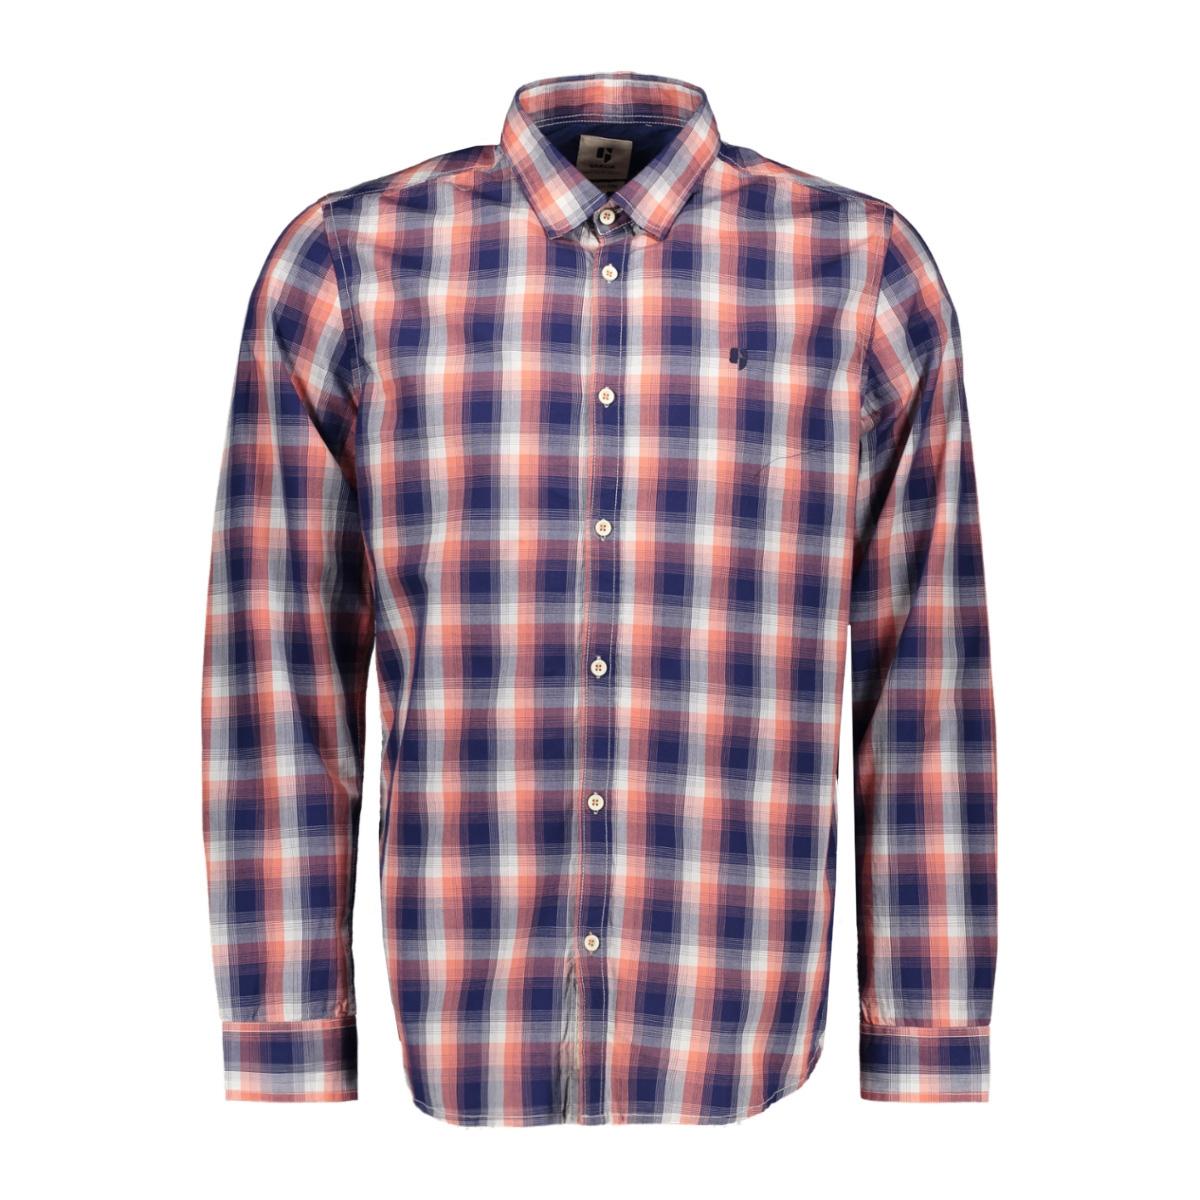 a91025 garcia overhemd 2706 dark apricot